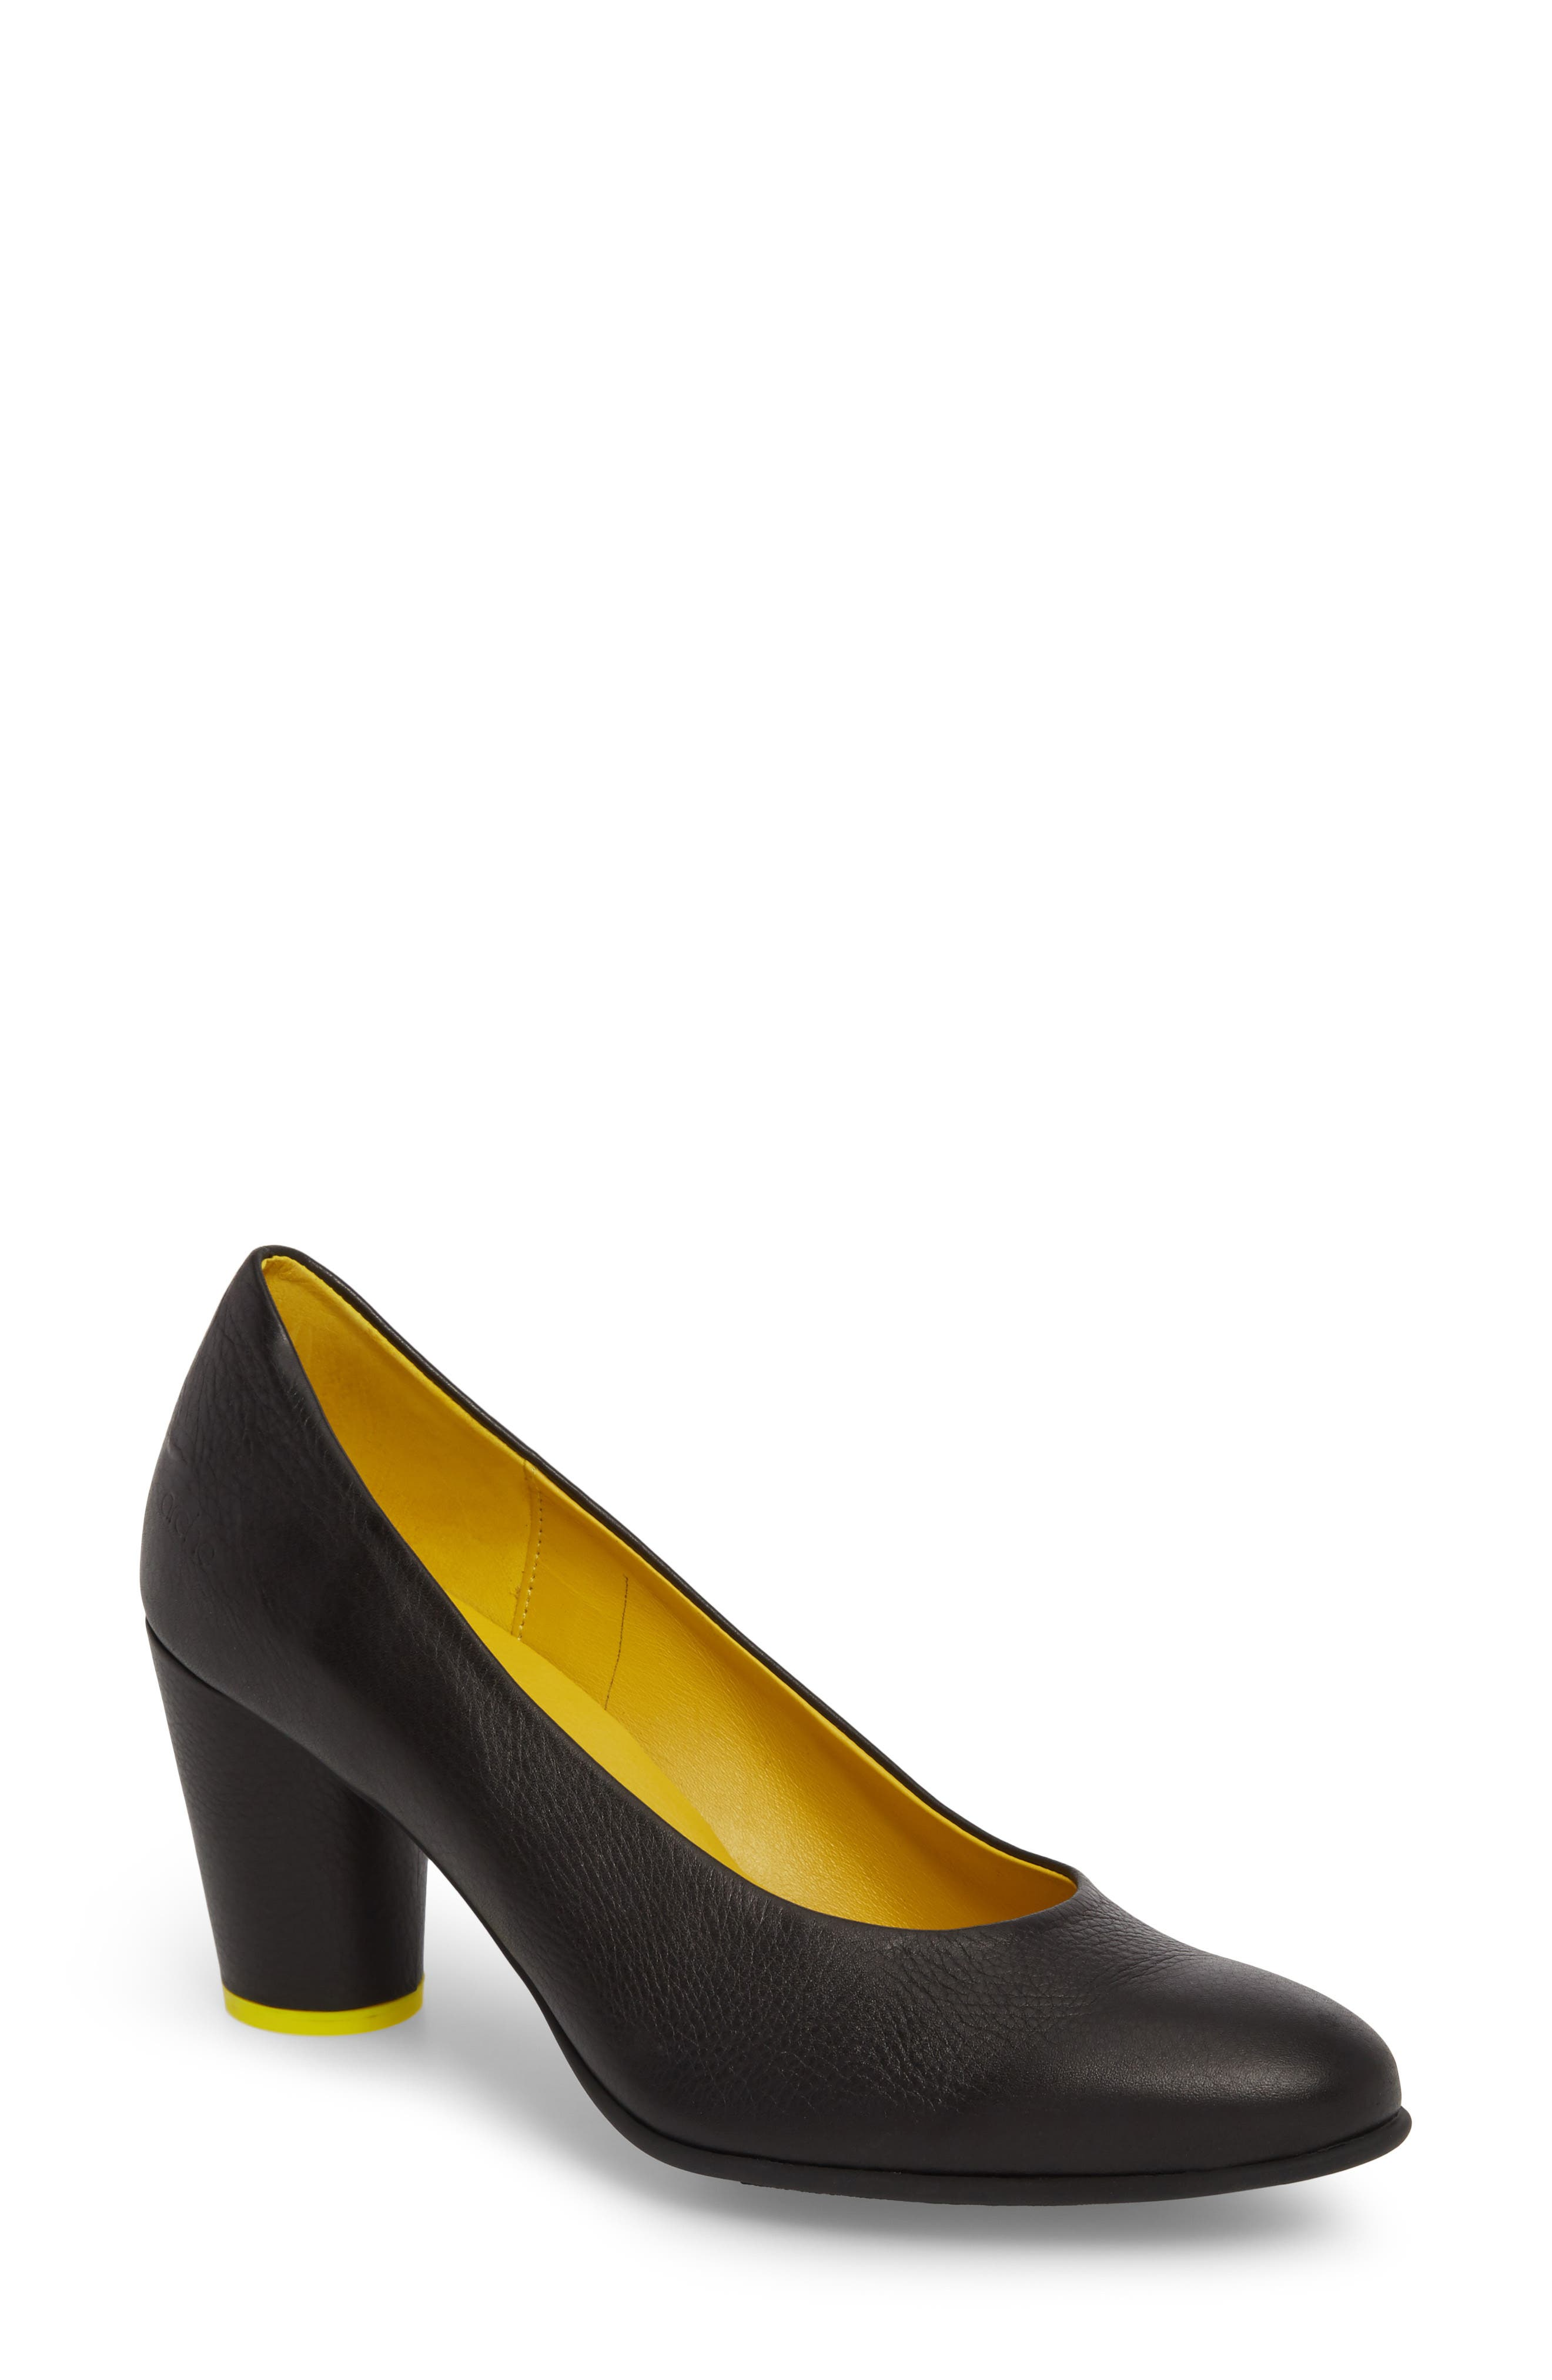 Kloemi Pump,                         Main,                         color, Noir/ Mimosa Leather